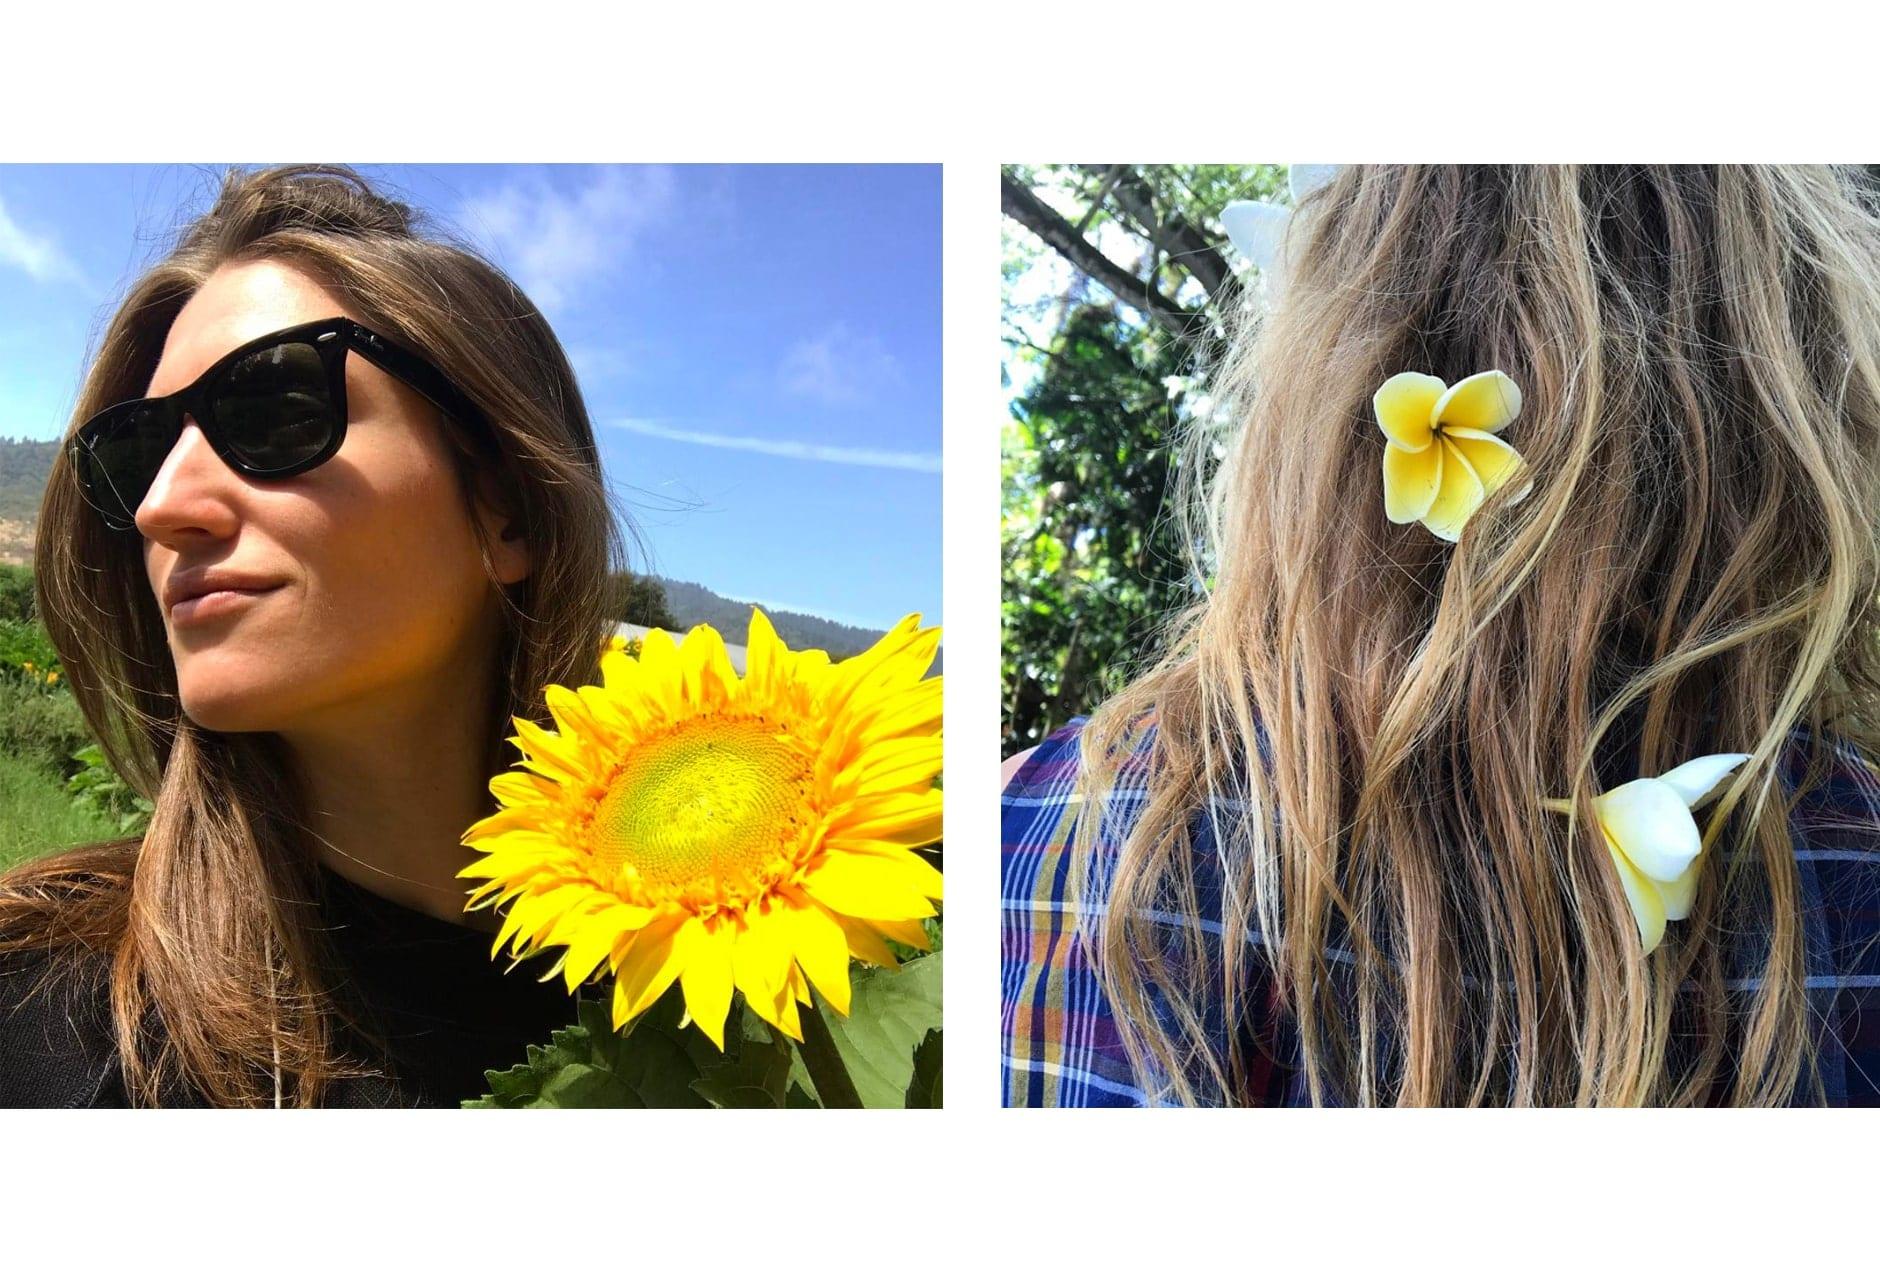 FLOWERS_kissser_constancejablonski-min